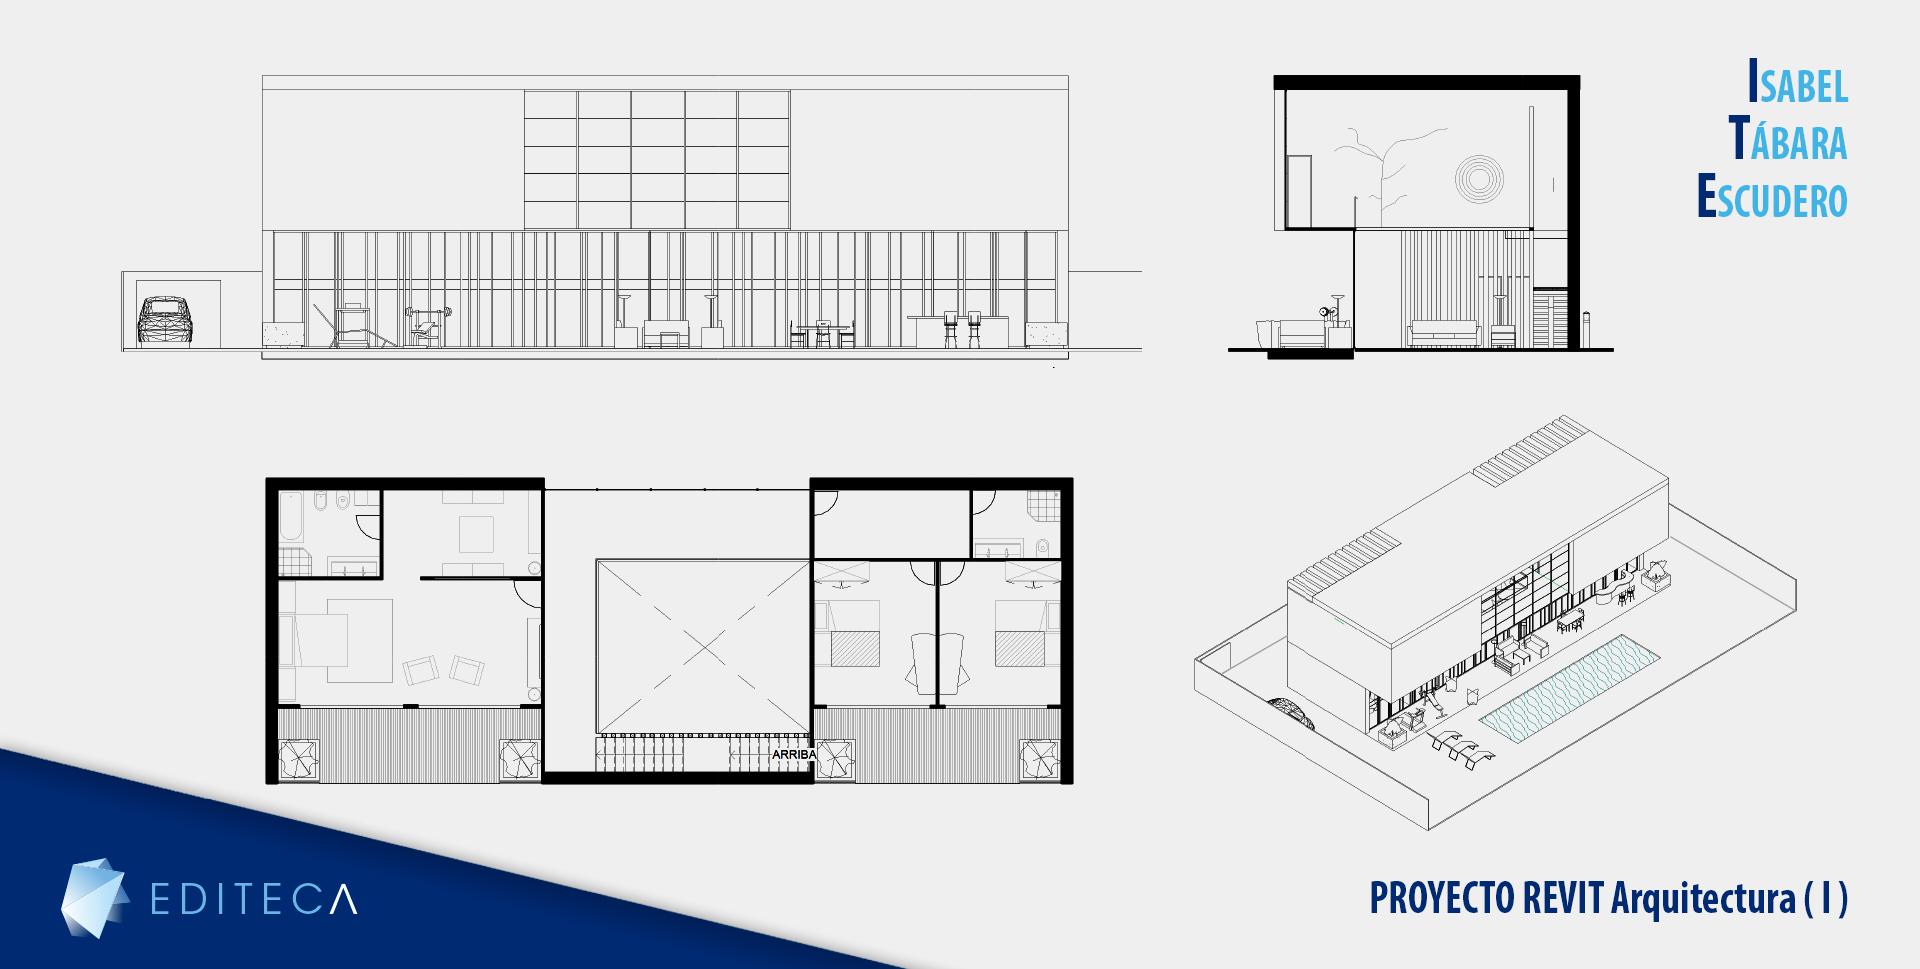 proyecto curso de revit arquitectura - Isabel